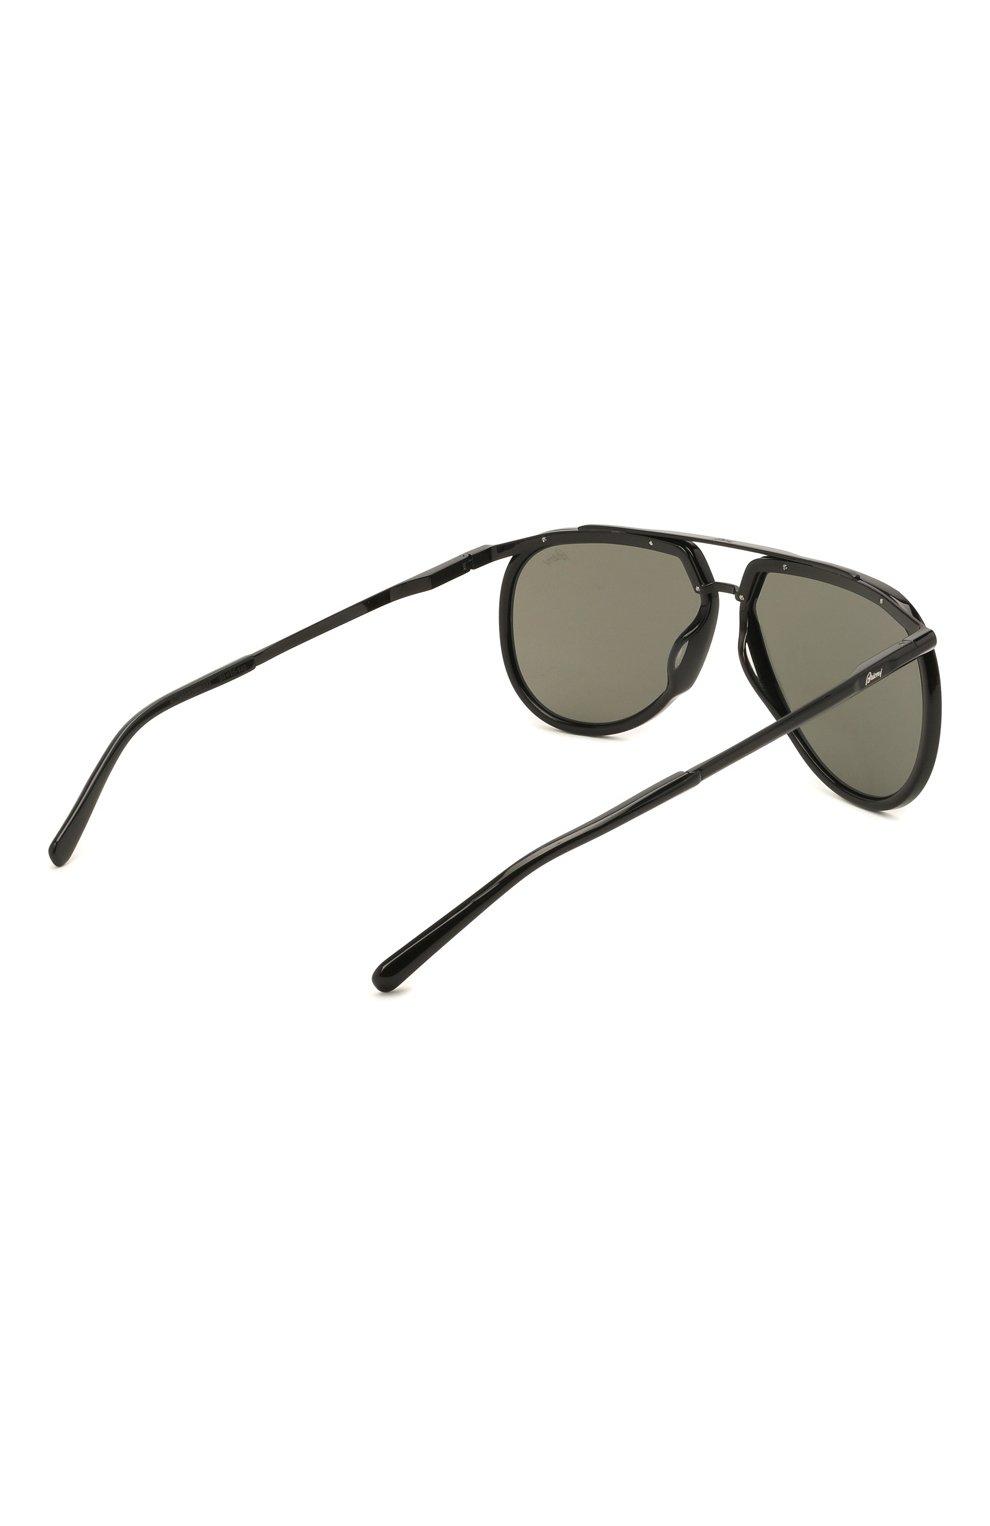 Мужские солнцезащитные очки BRIONI черного цвета, арт. 0DC900/P3ZAC | Фото 4